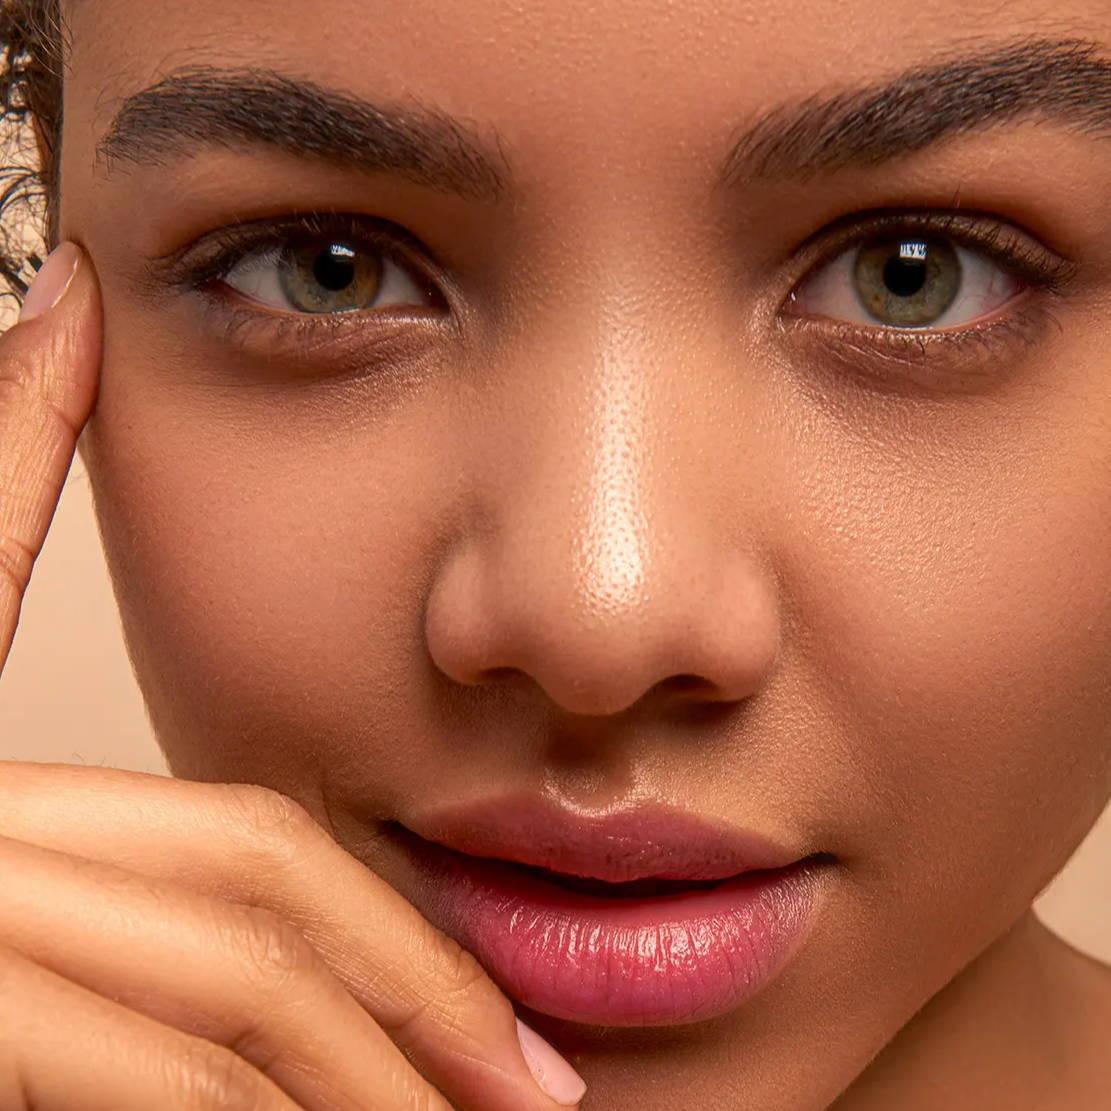 Bolt Beauty - Eco friendly skincare - sustainability